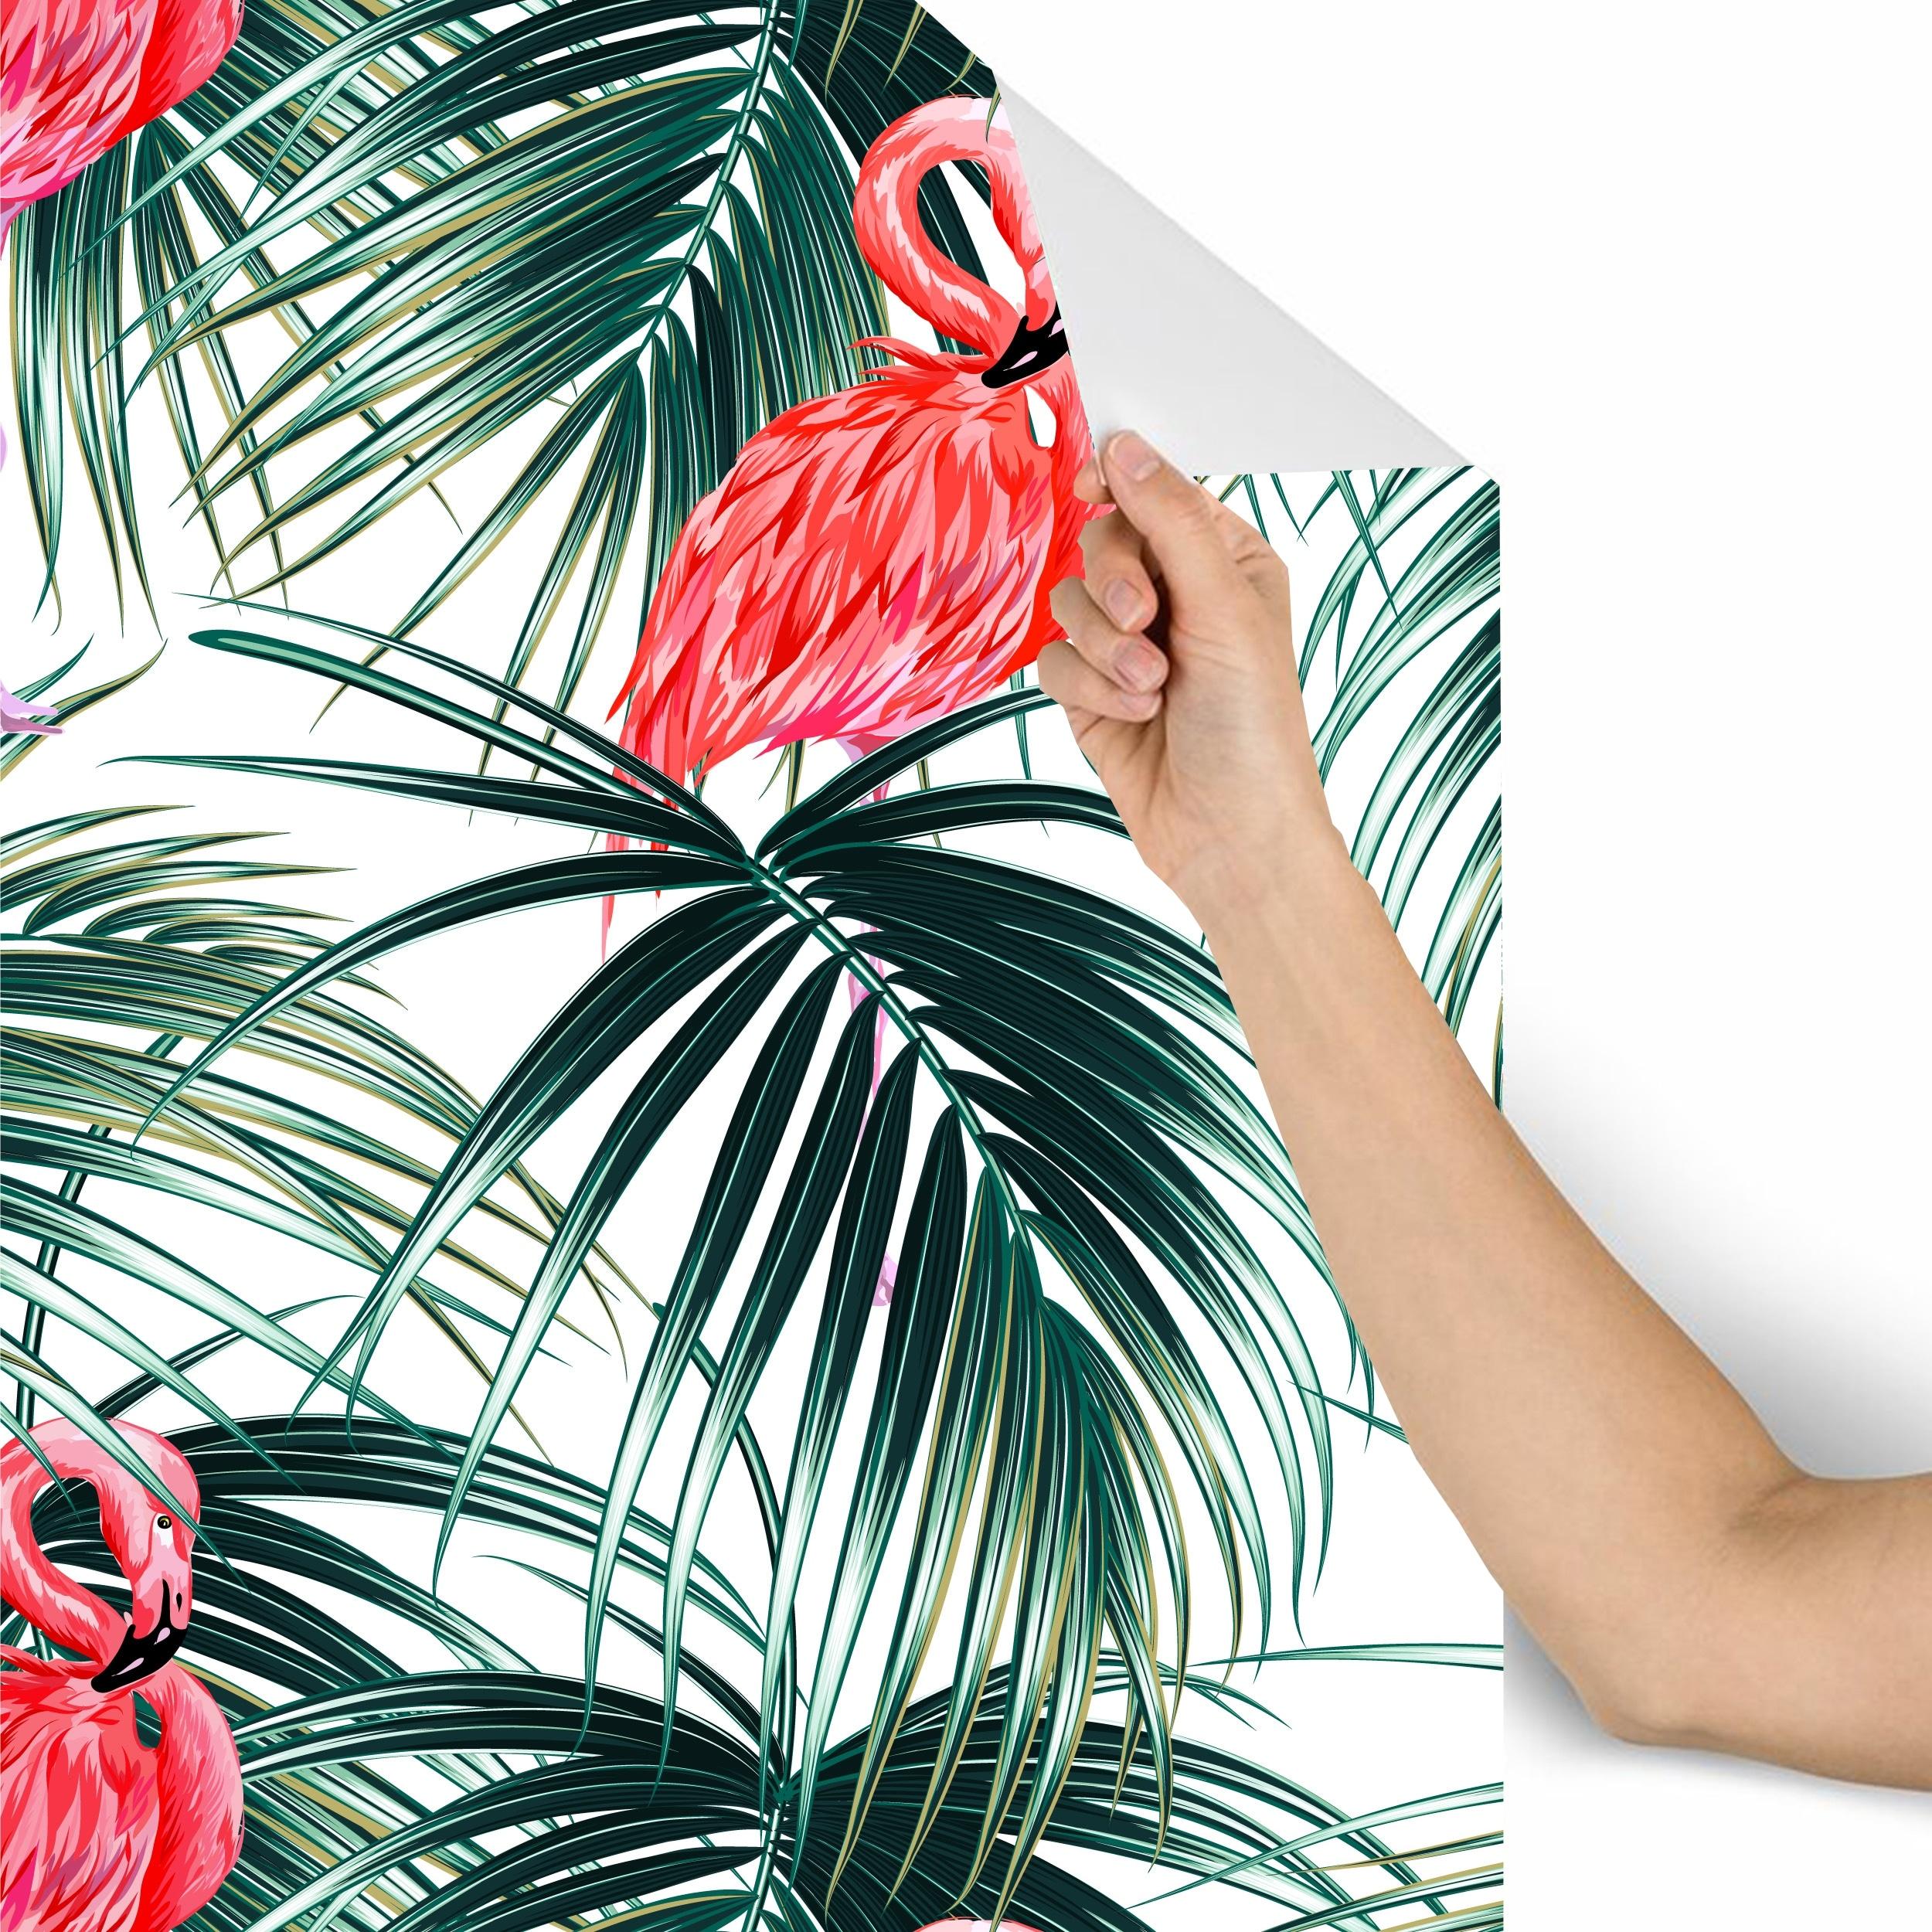 Wallpaper Roll Tropical Tunes Summer Flamingo Beach Decor 24in x 27ft